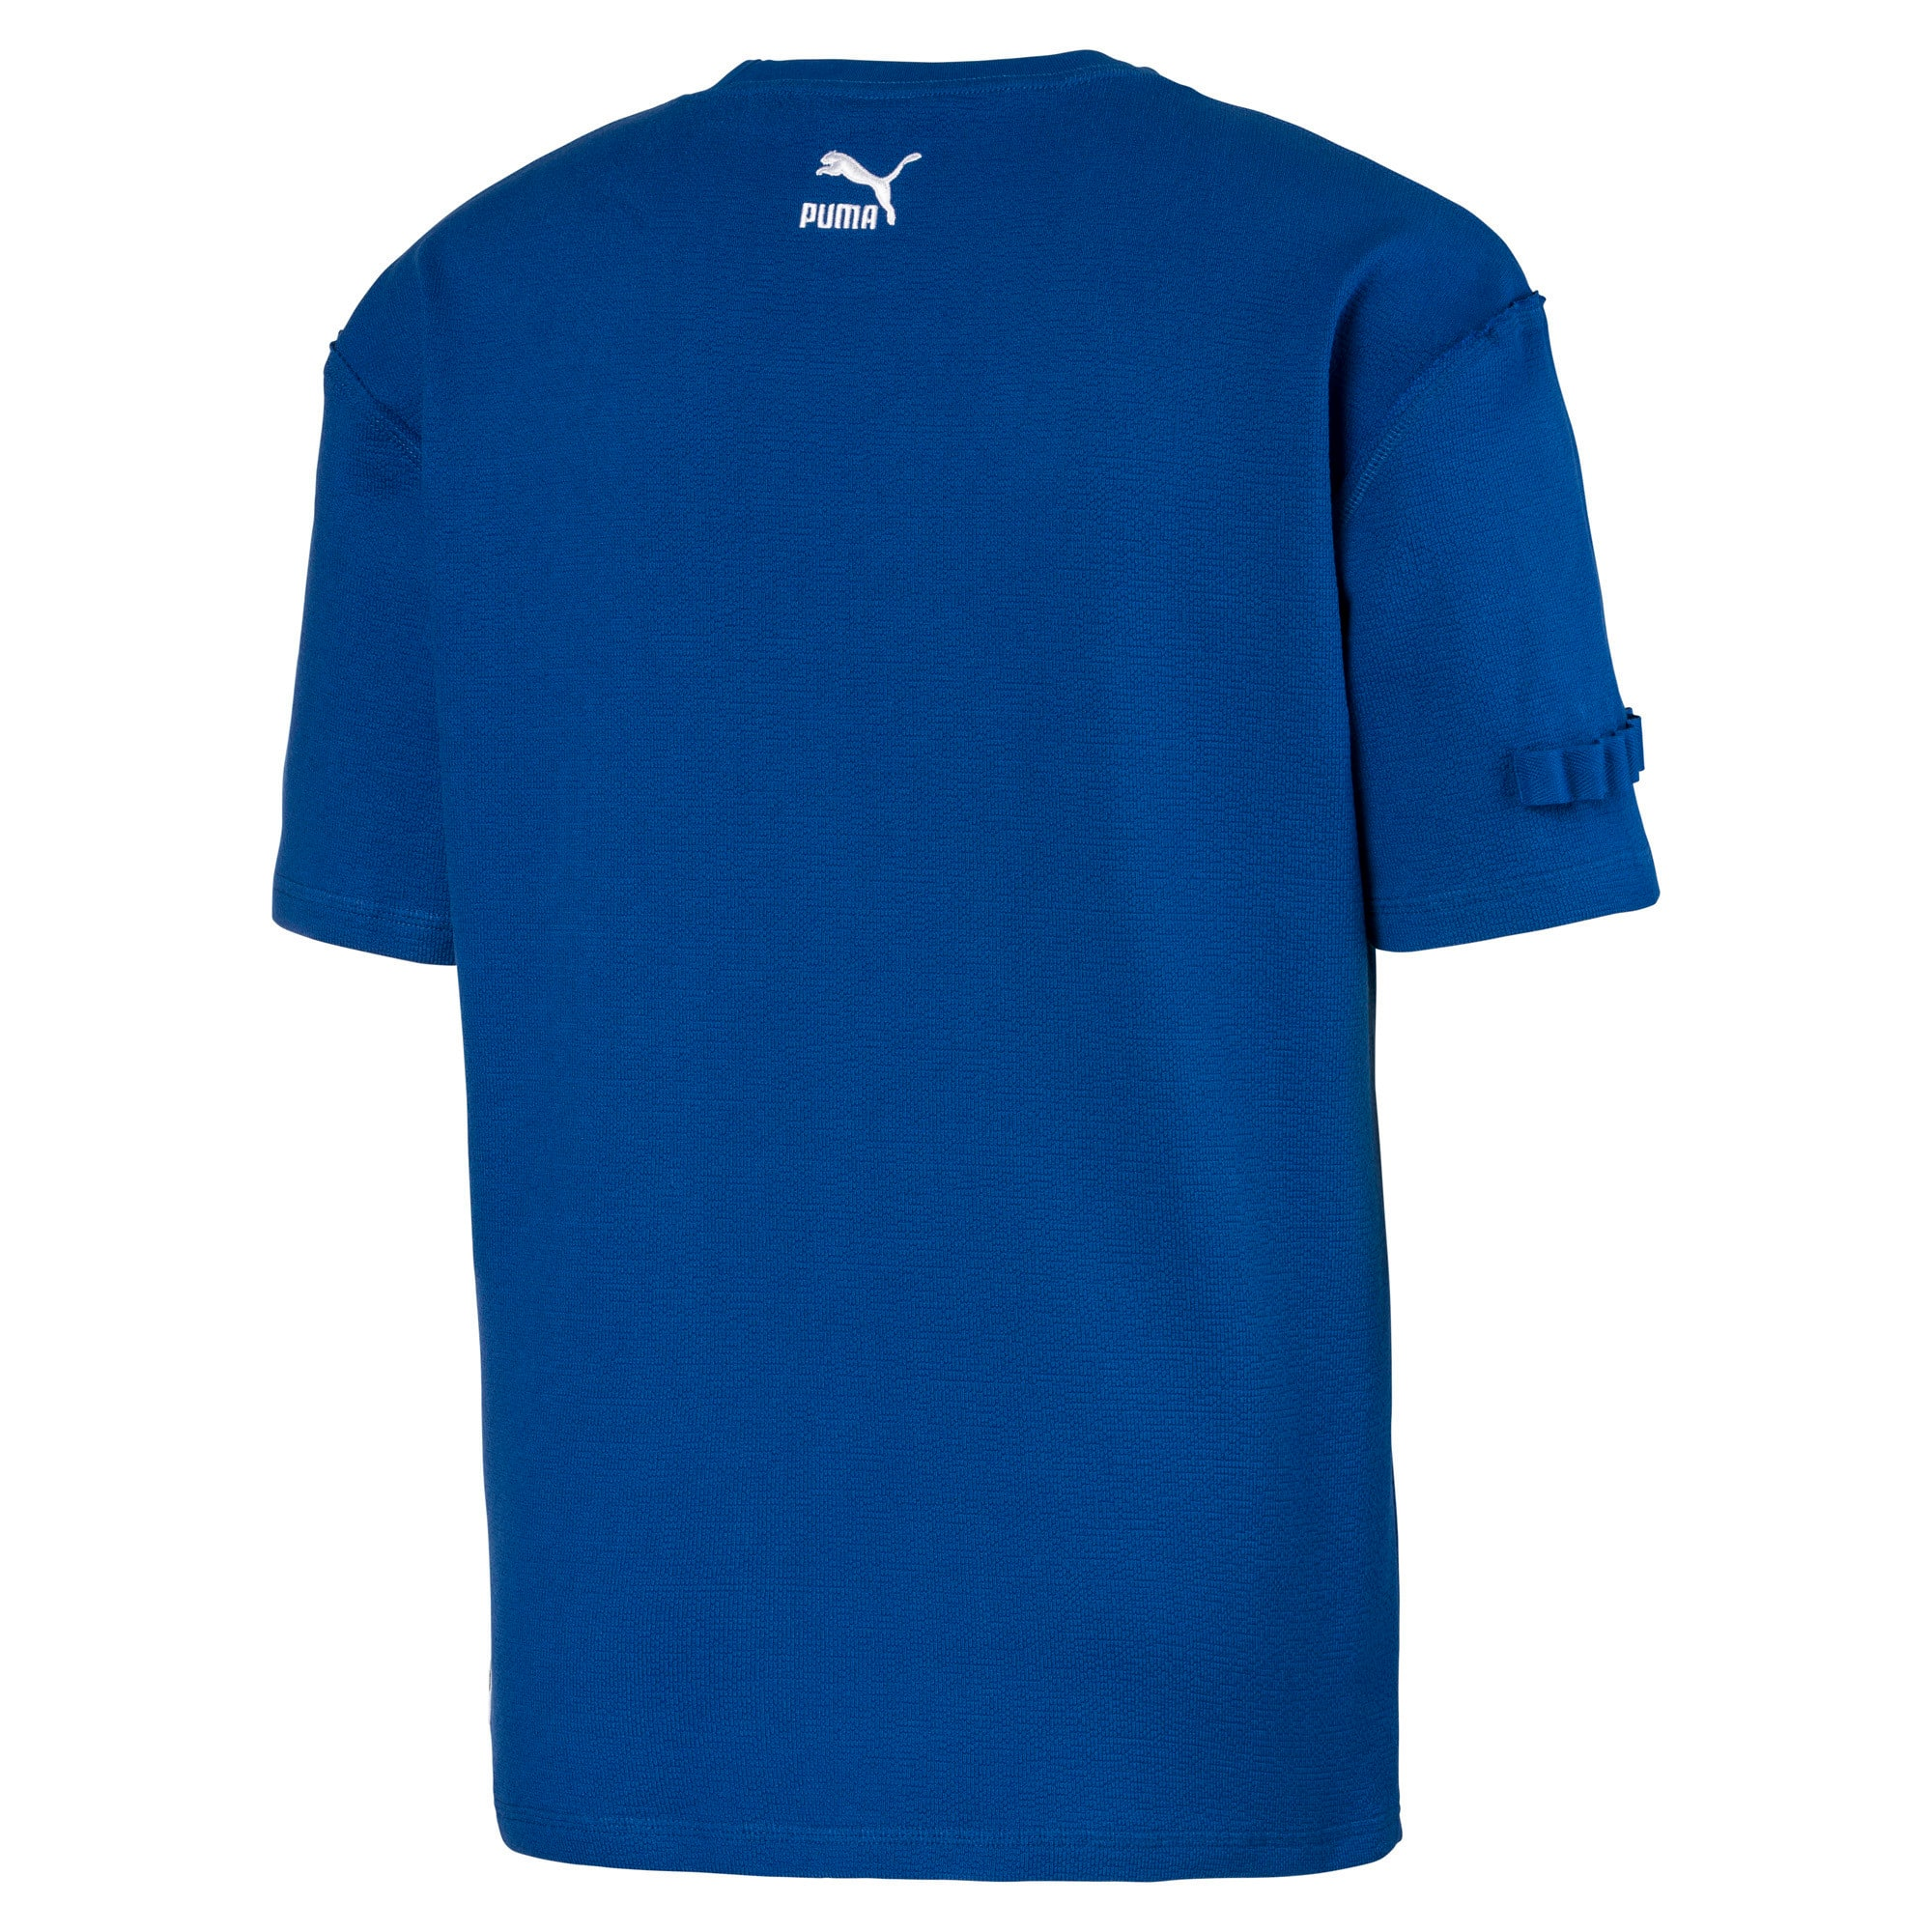 Thumbnail 2 of PUMA x TYAKASHA Tシャツ, Galaxy Blue, medium-JPN